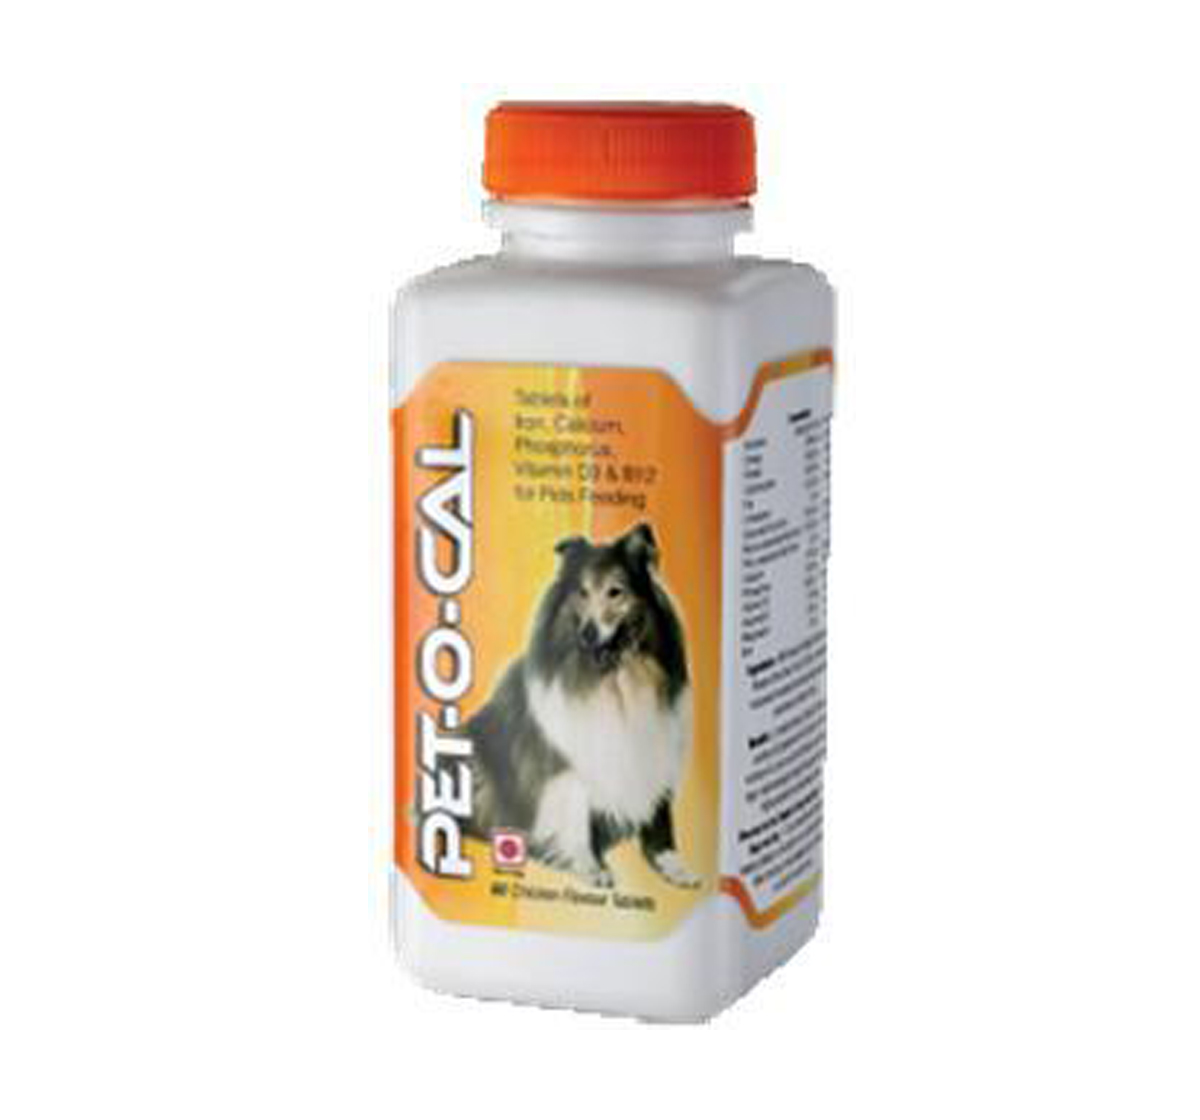 cat safe slug repellent